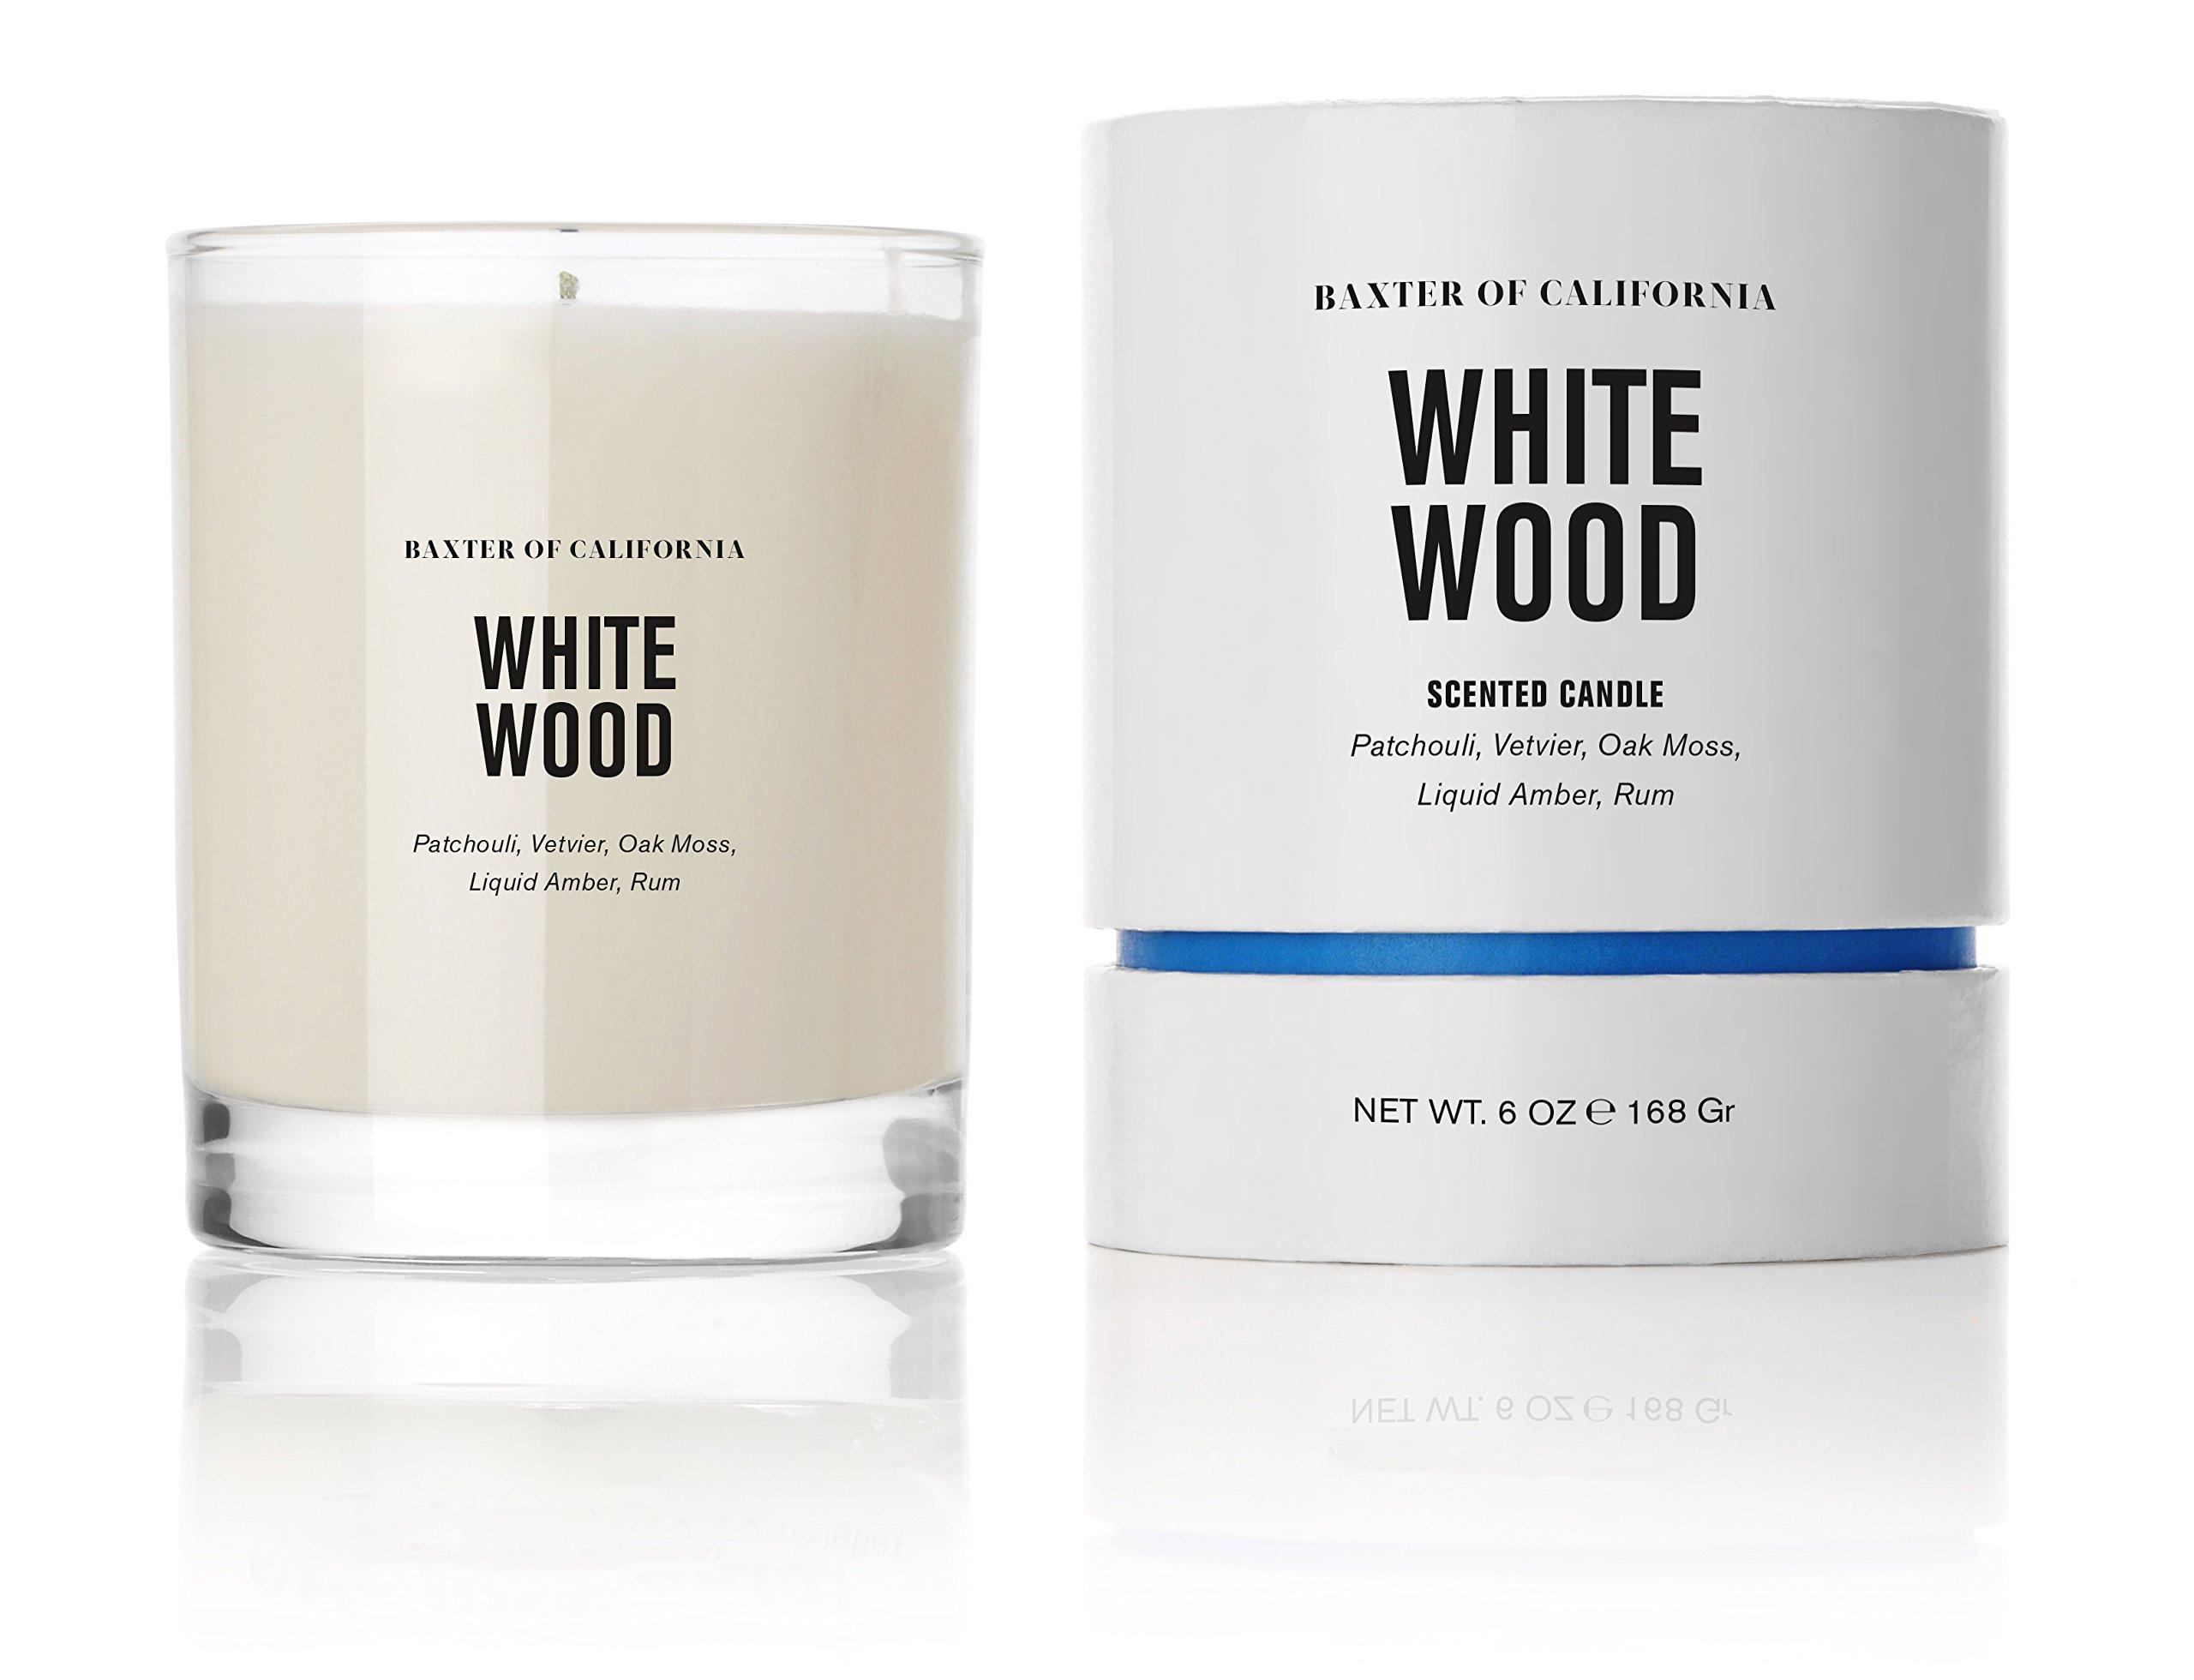 Baxter of California Candle, White Wood, 6 oz.